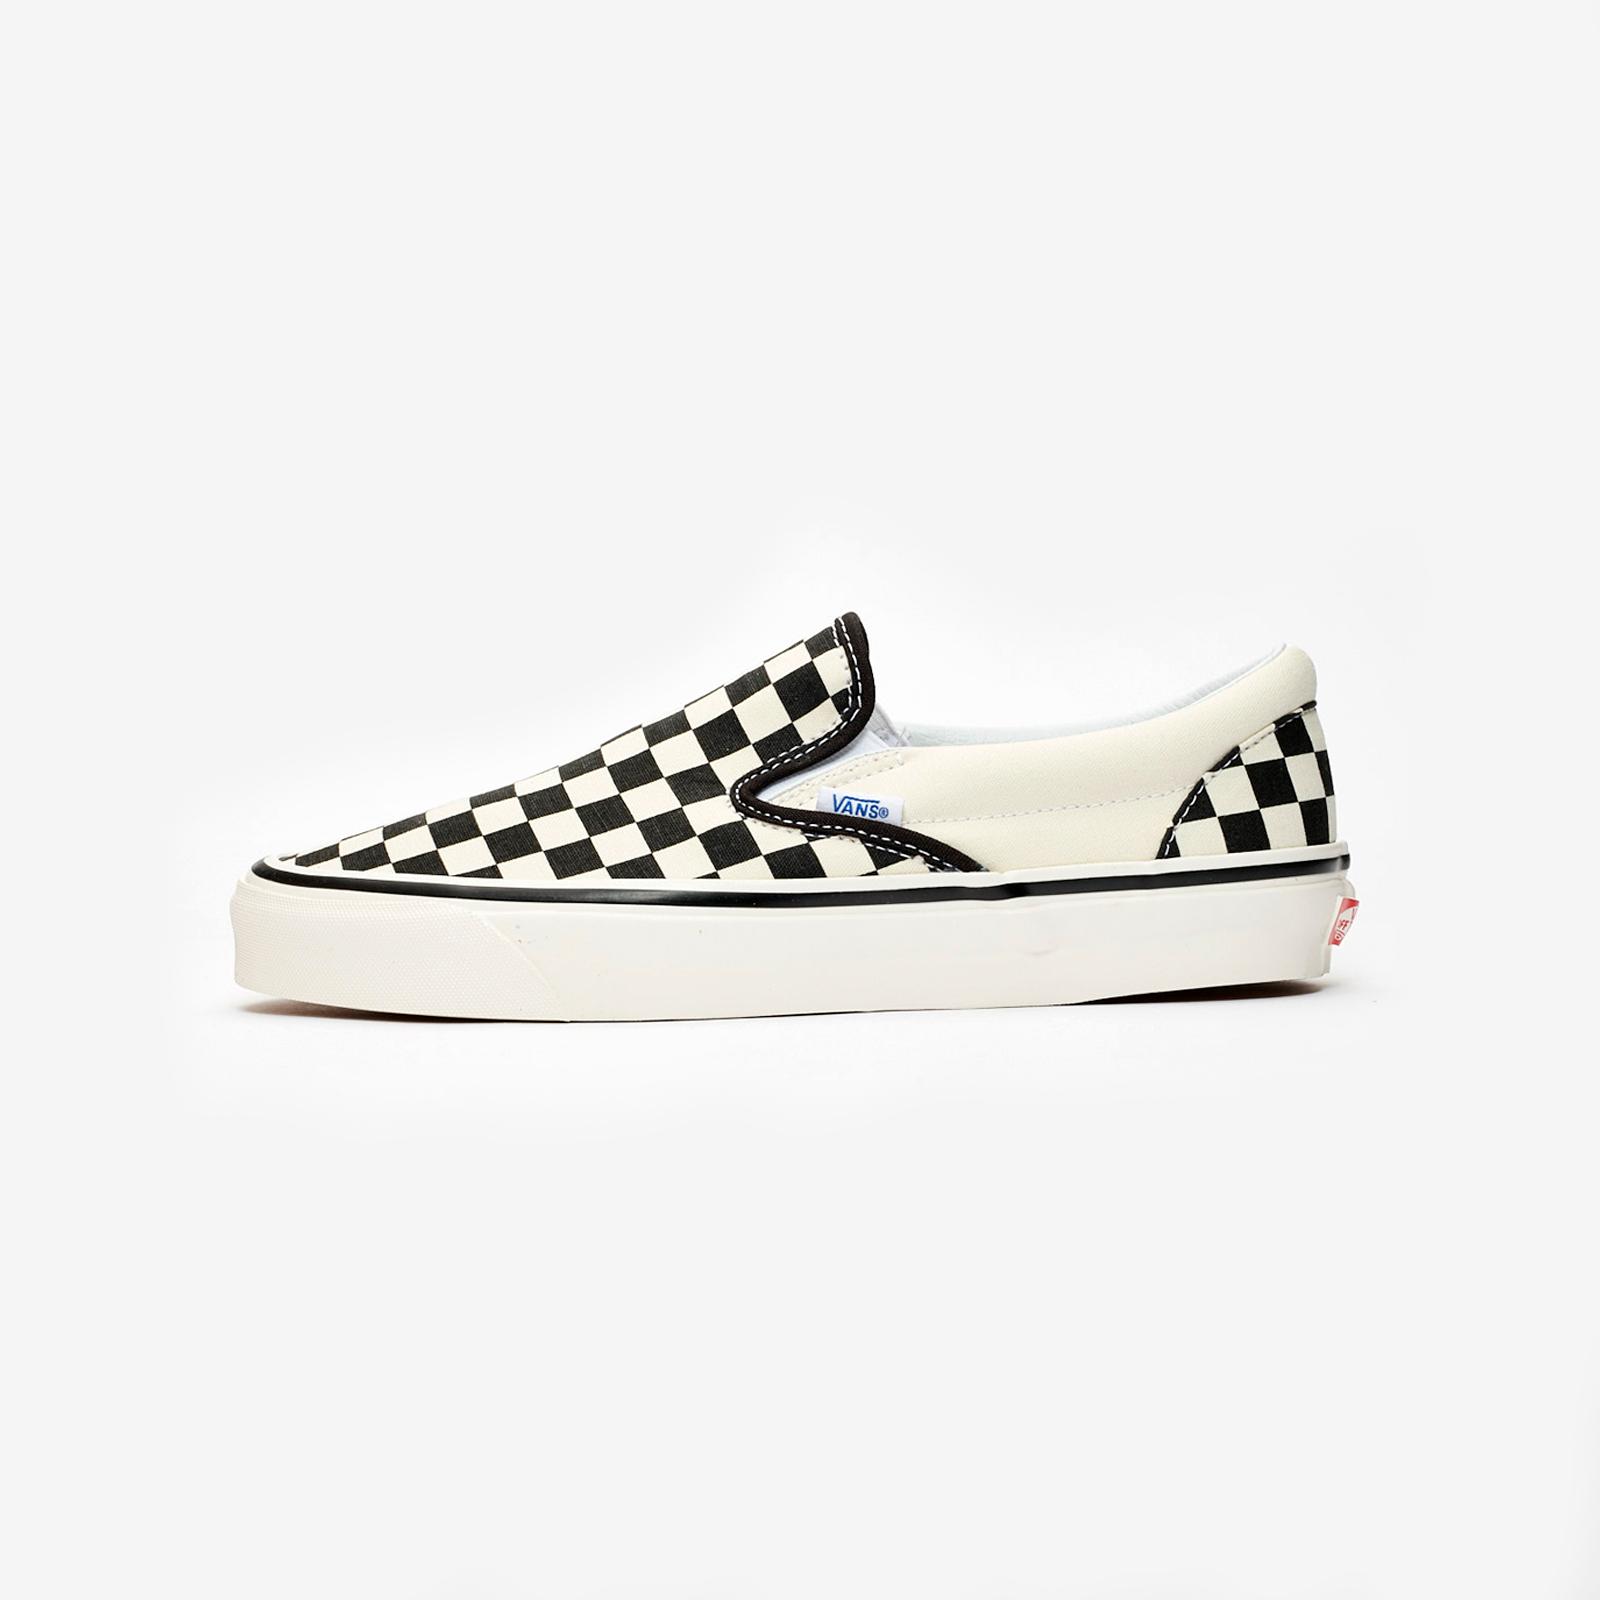 Vans UA Classic Slip-On 98 DX - Va3jexpu1 - SNS | sneakers ...